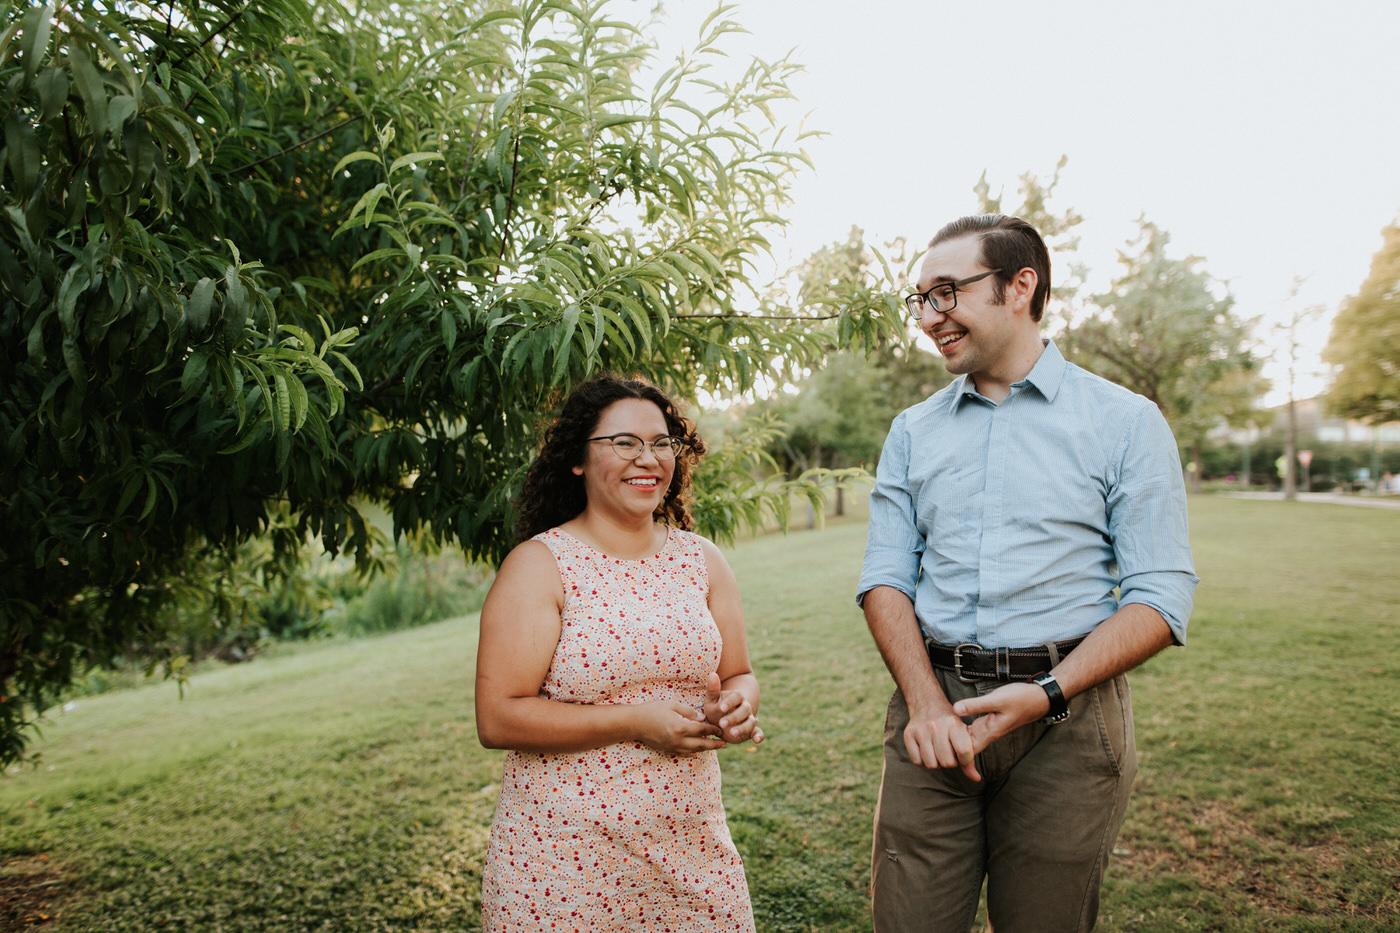 Austin Mueller Park Engagement - Diana Ascarrunz Photography-38.jpg